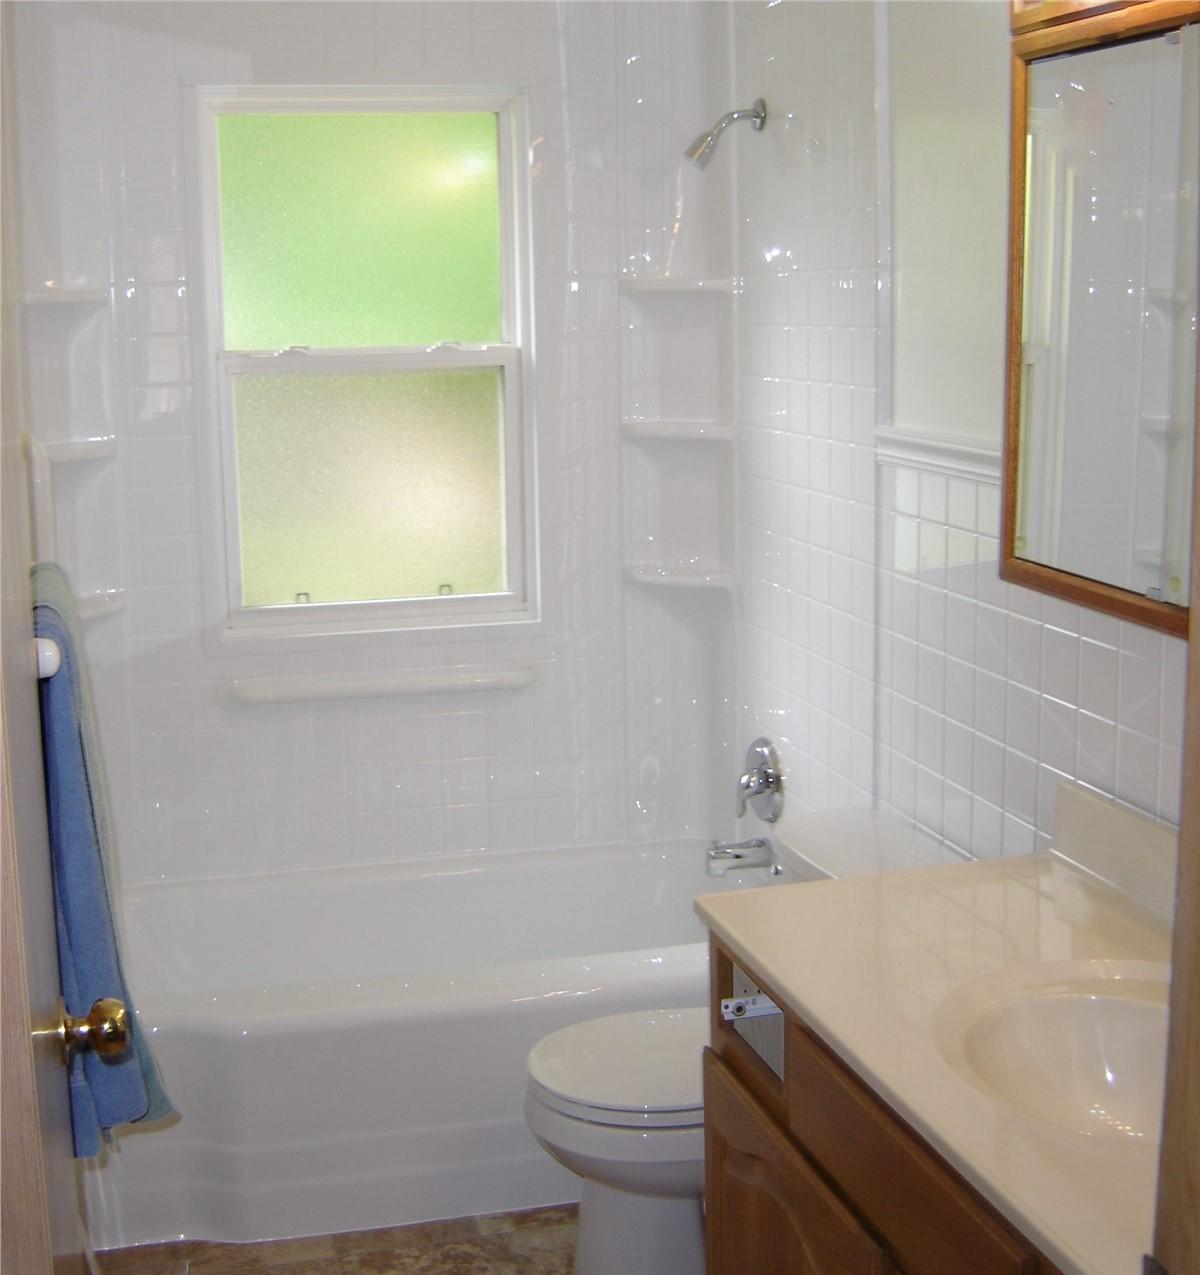 Charleston One Day Baths Mount Pleasant One Day Bathtubs - Bathroom renovations charleston sc